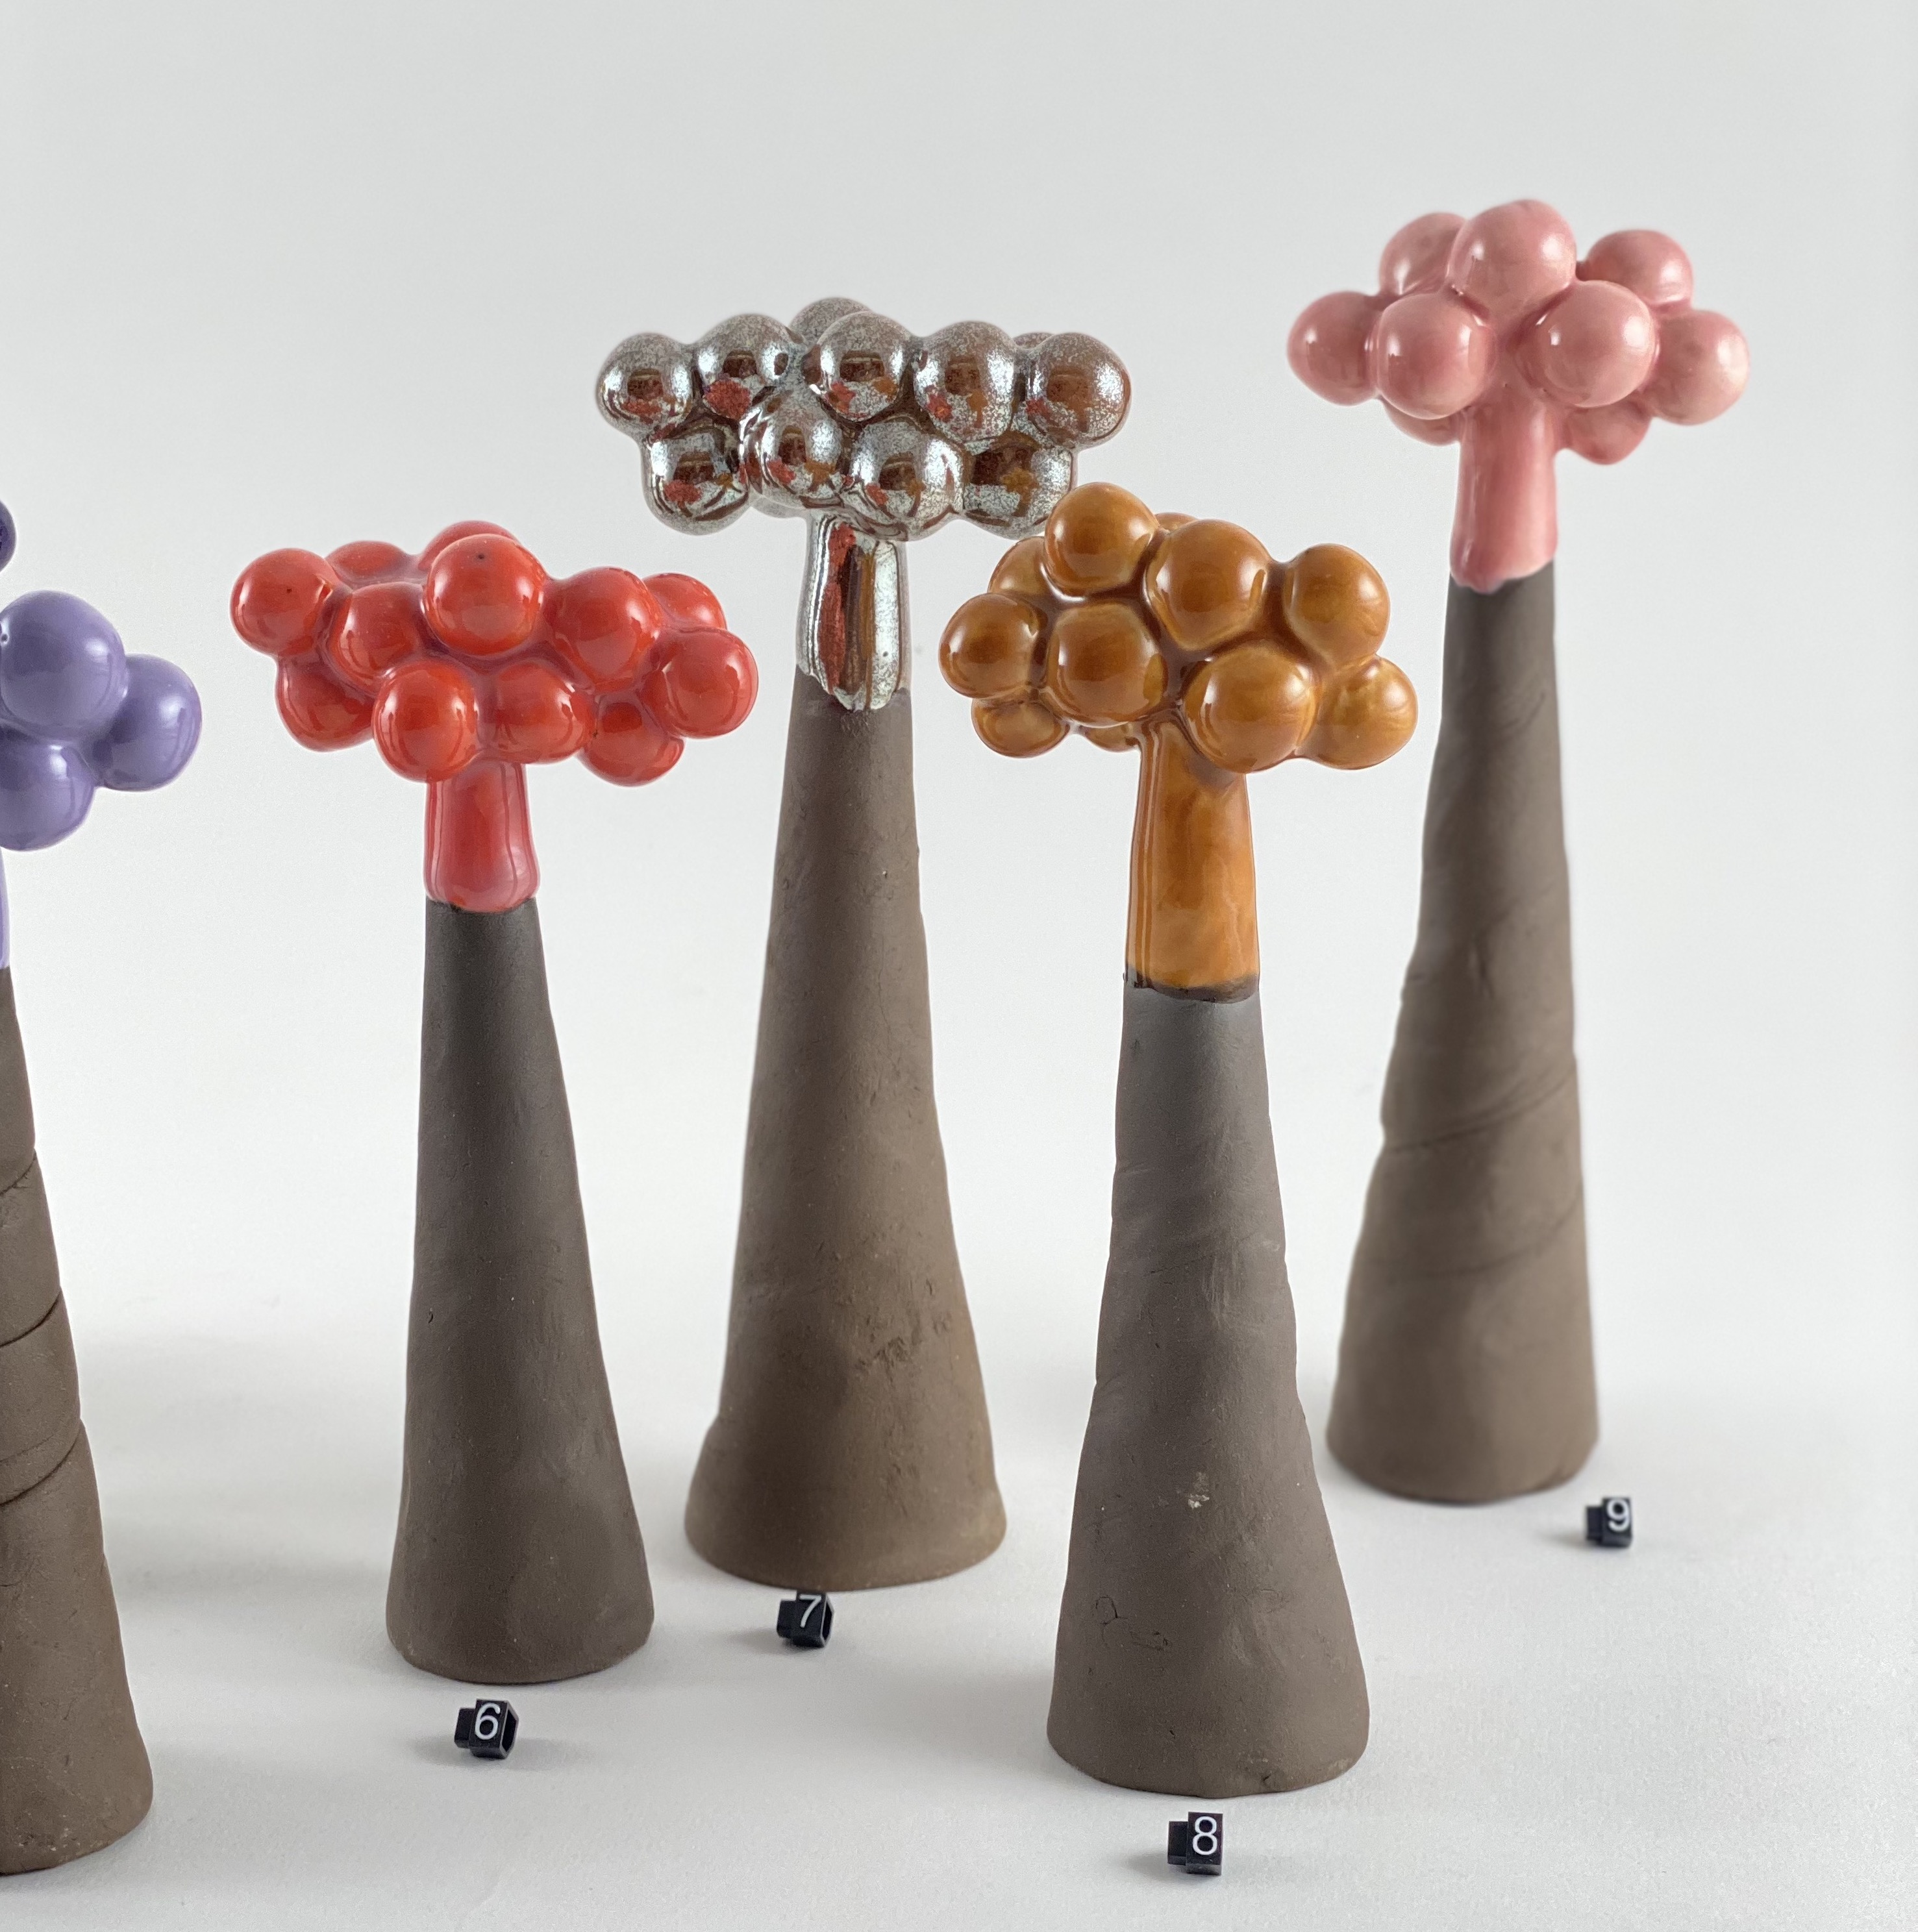 Skov // små træer - nye farver